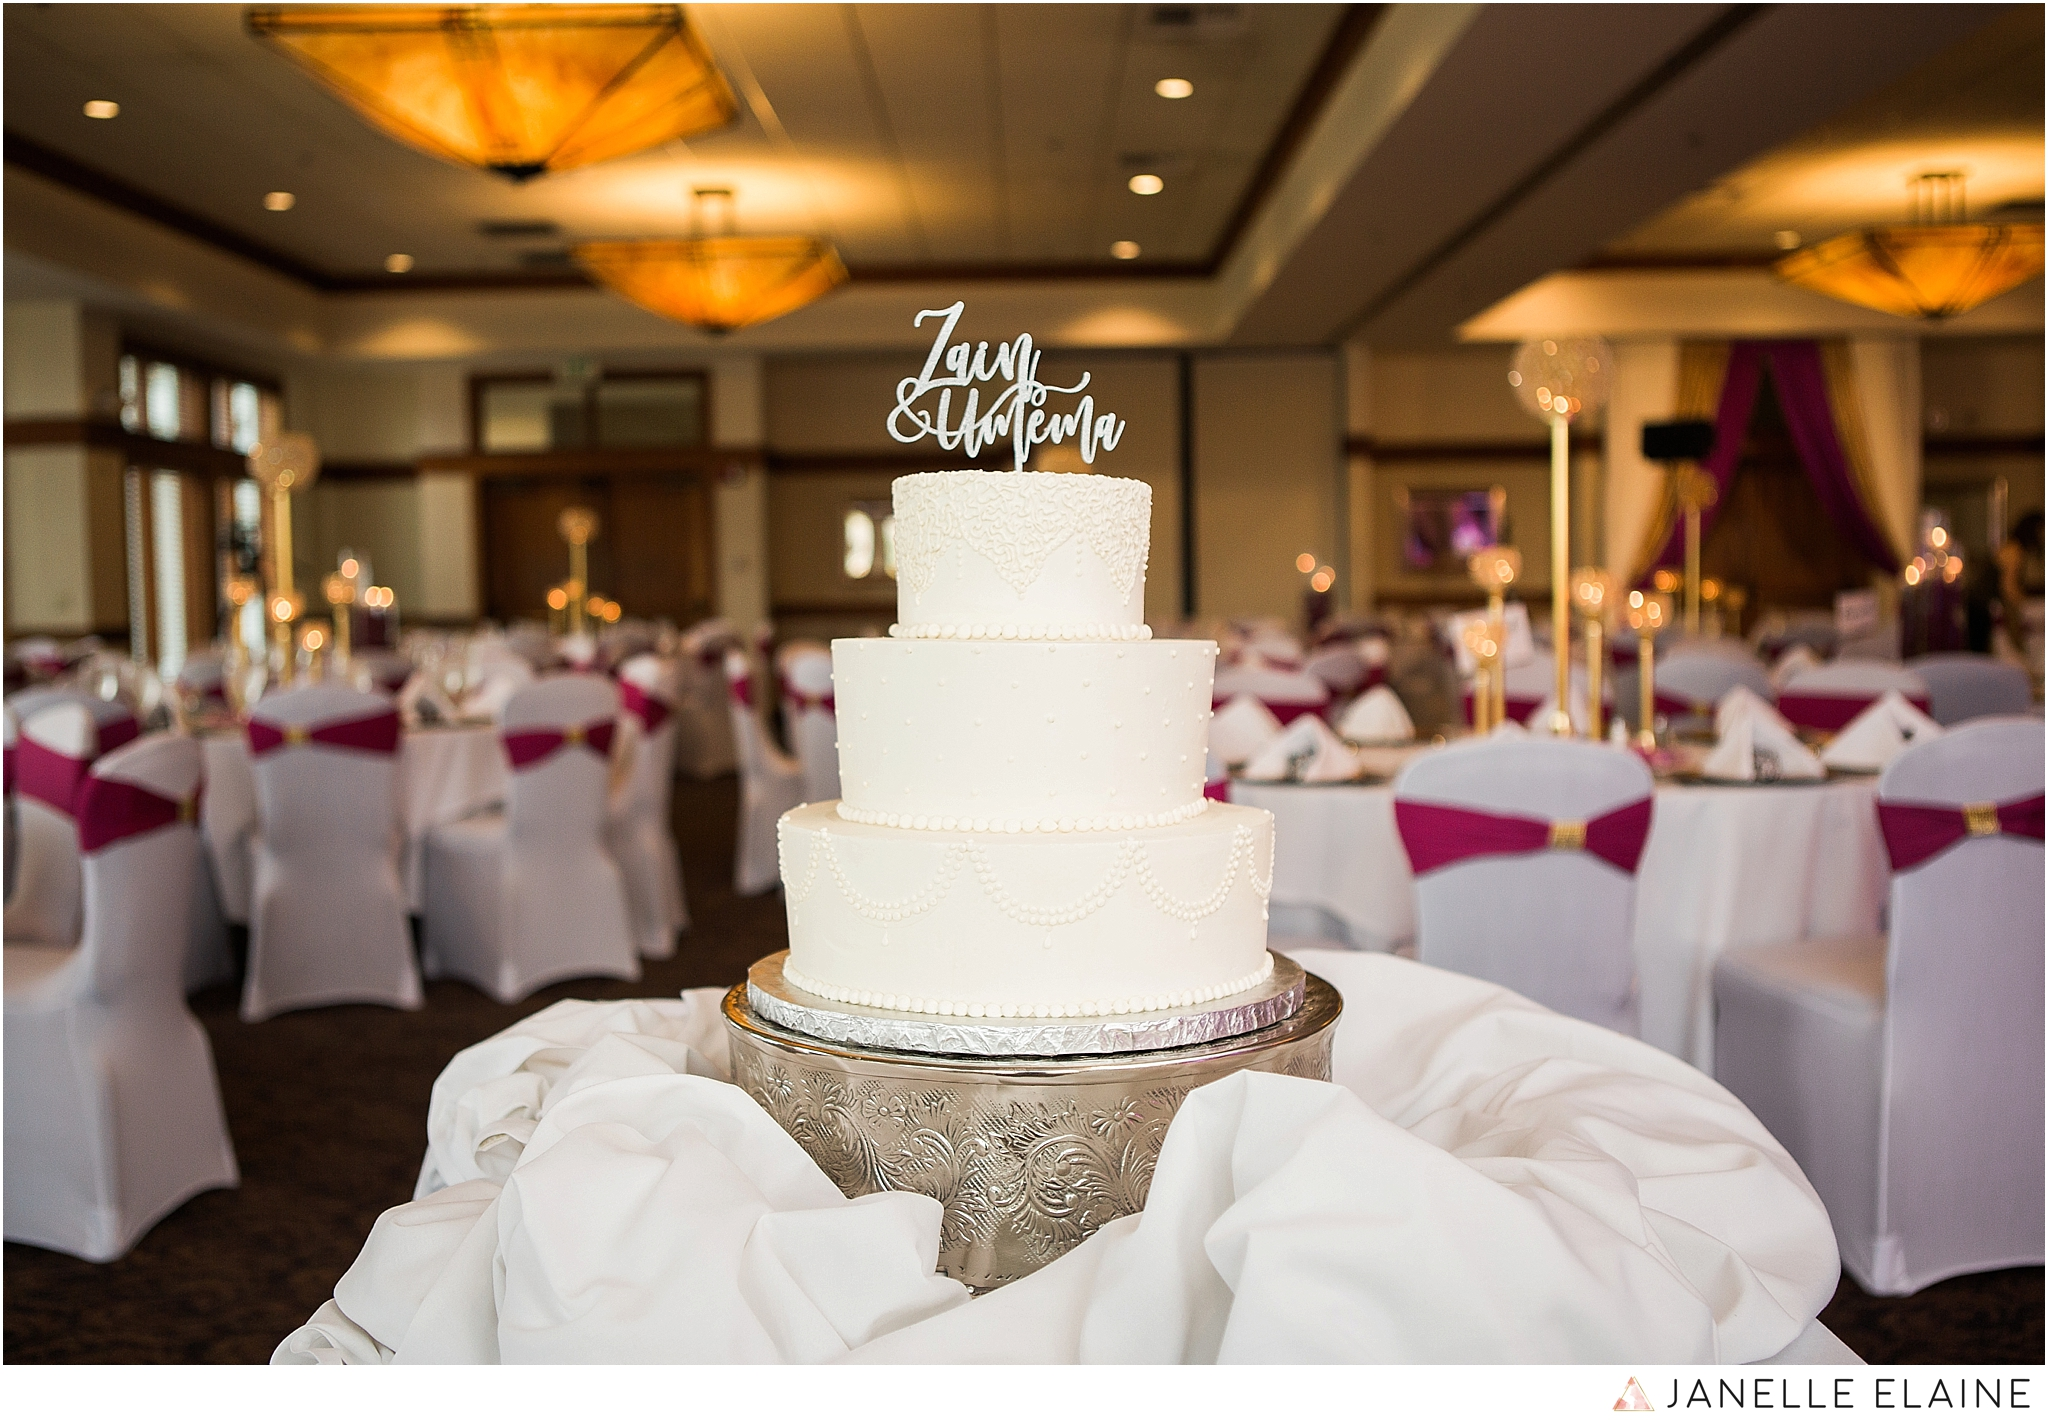 janelle elaine photography-the club at snoqualmie ridge-washington-wedding-photography-reception-31.jpg